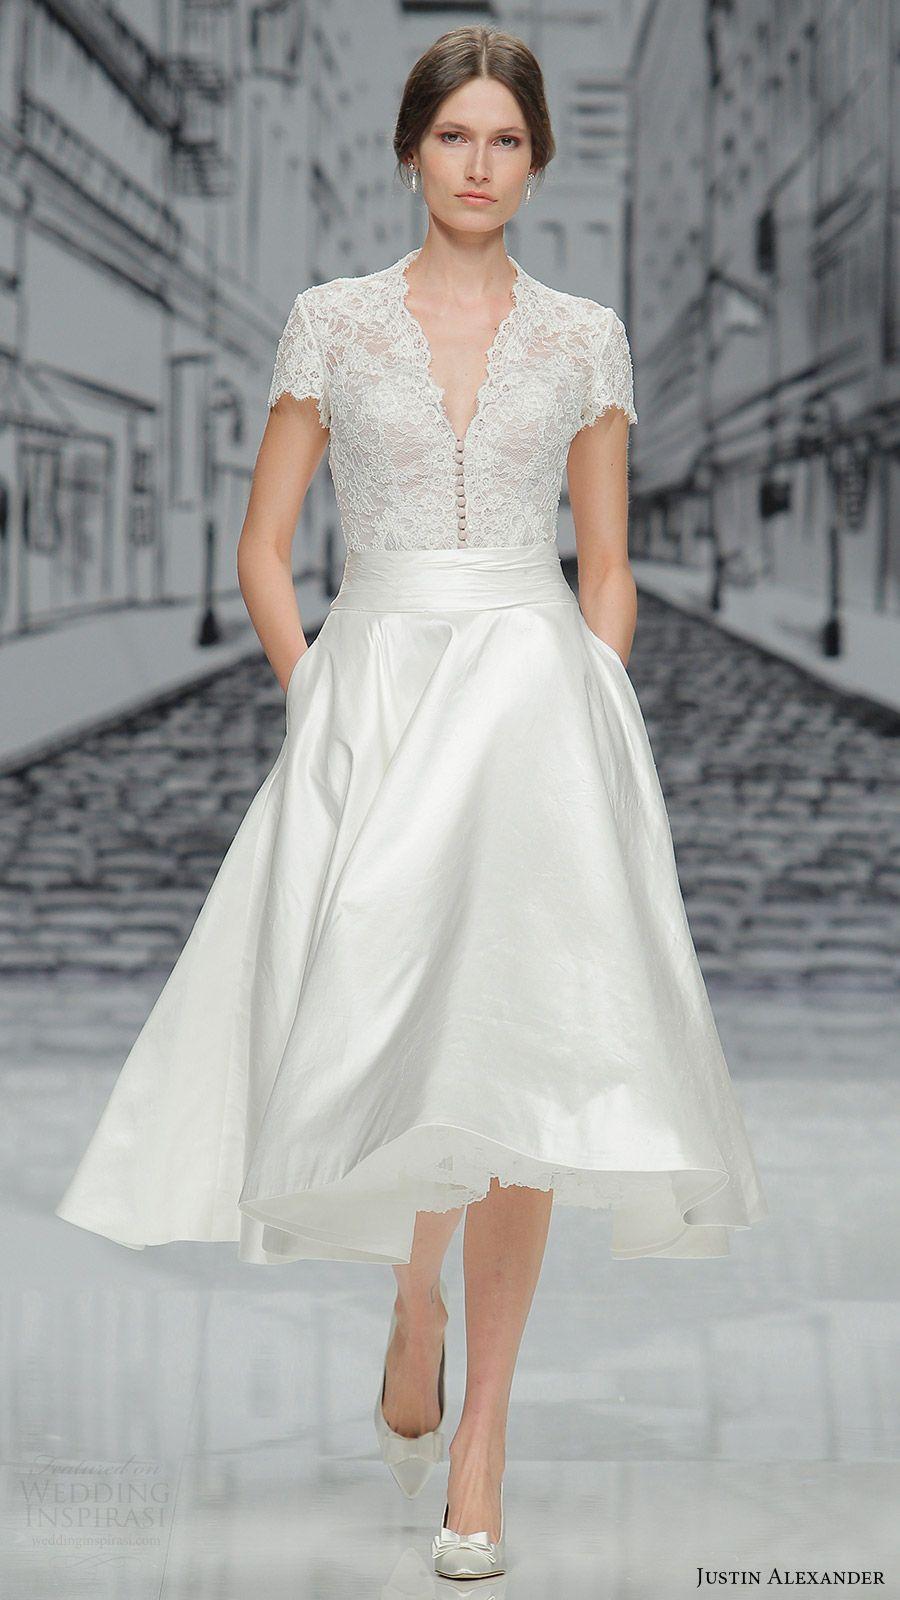 Justin Alexander Spring 2017 Collections Barcelona Bridal Week Runway Presentation Short Dressesshort